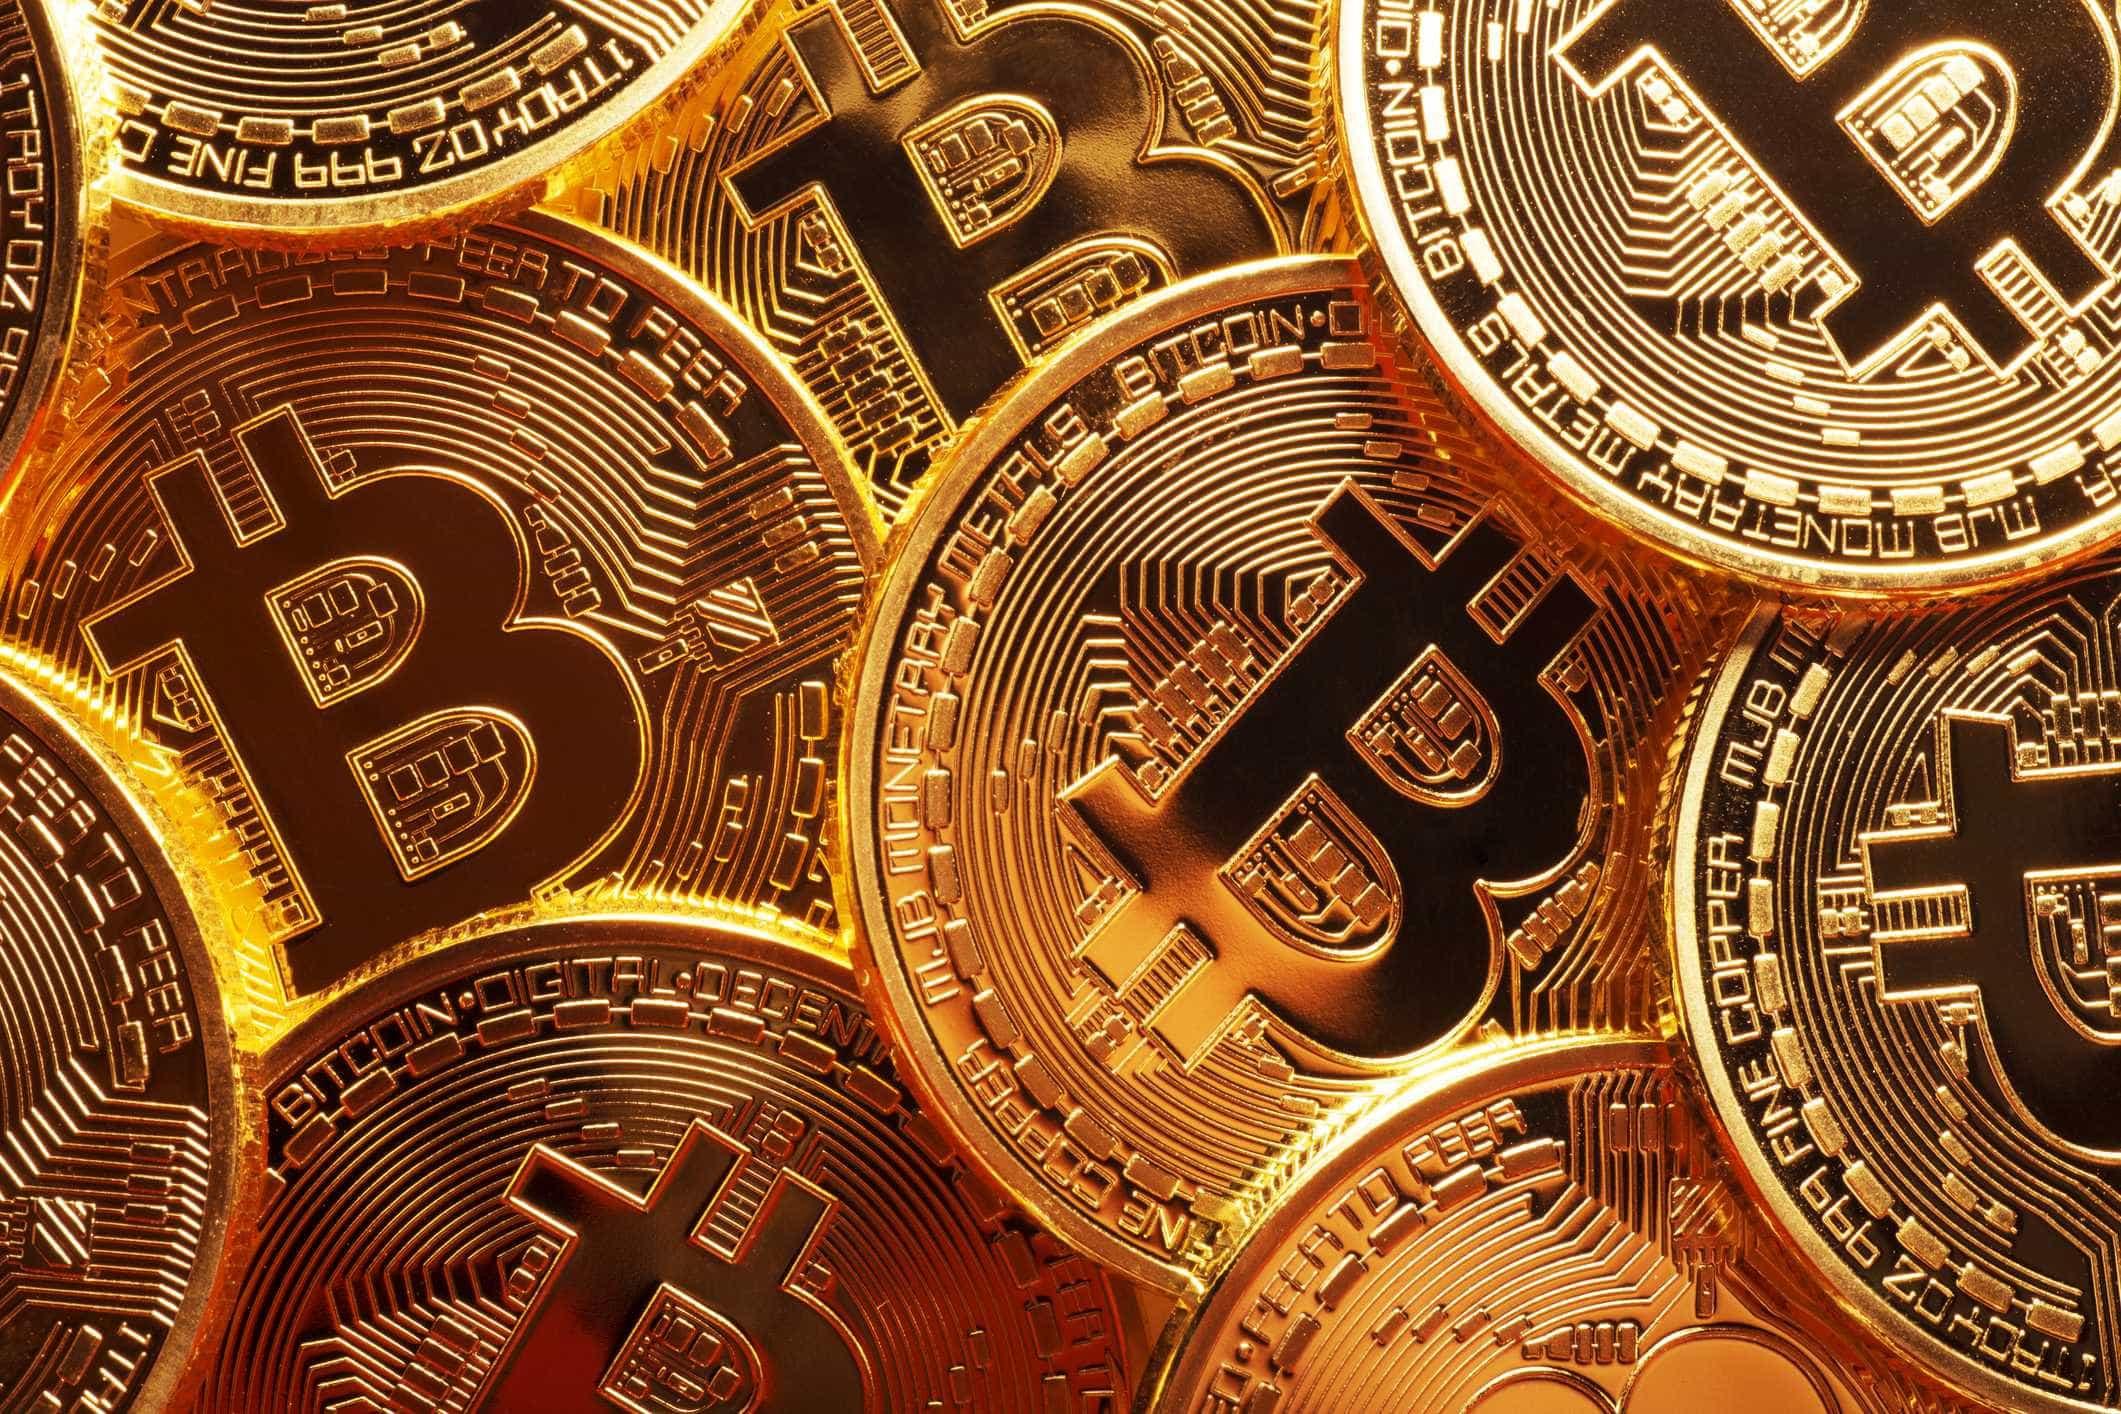 JPMorgan alerta que Bitcoin vale menos do que custa produzi-la